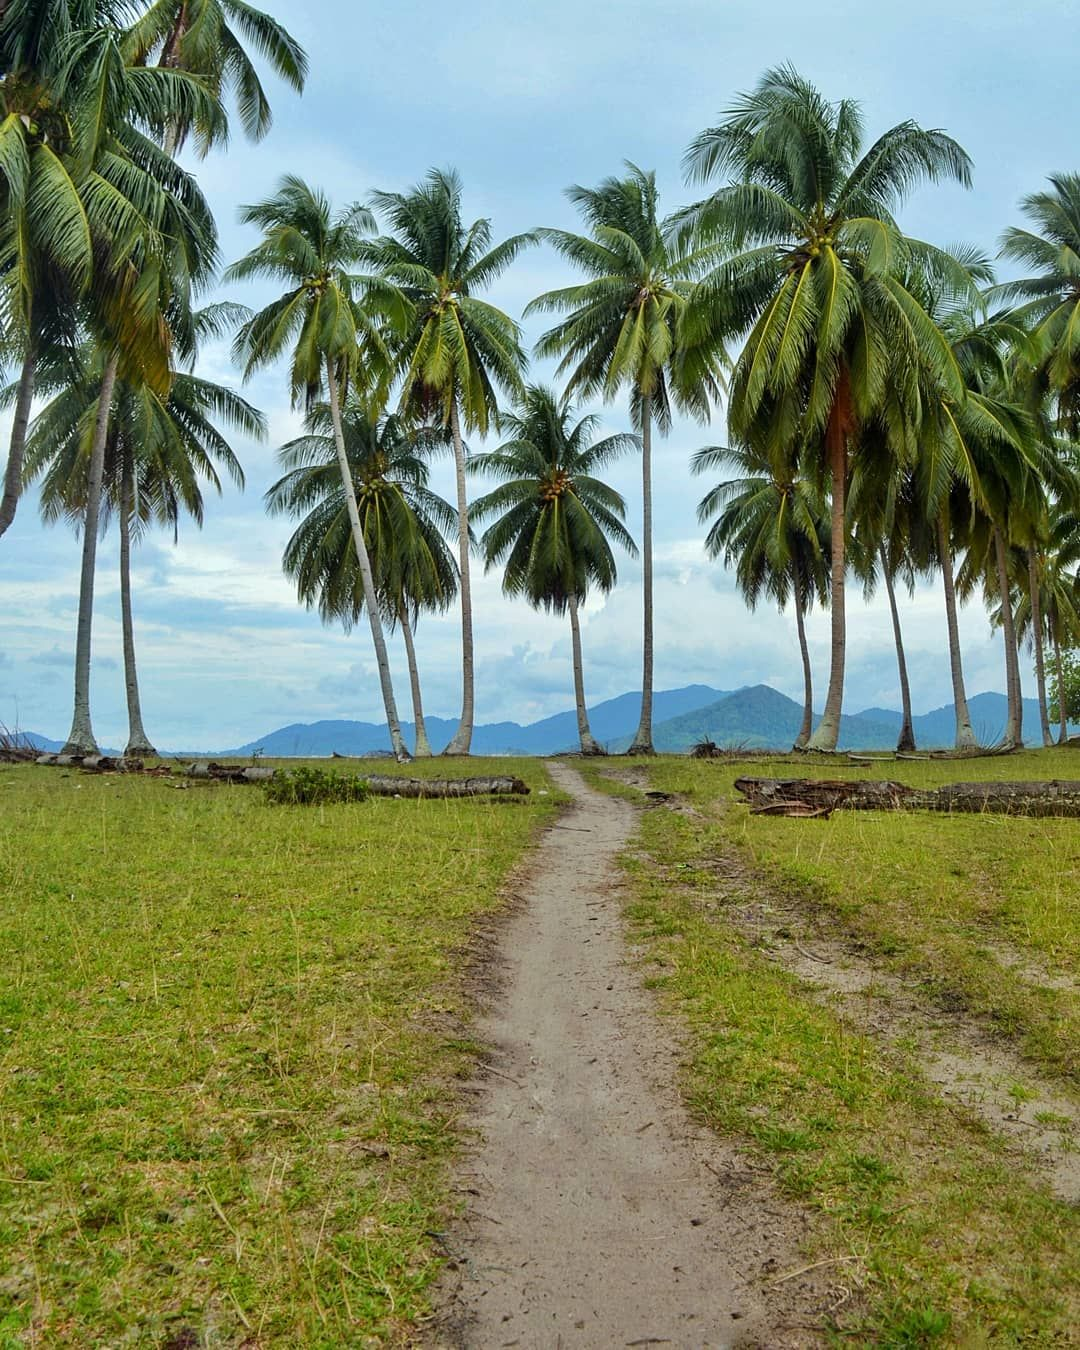 Nature Tropical Landscape Letung Padangmelang Anambas Wonderful Indonesia Instatravel Nature Tropical Landscape Letung Country Roads Country Road